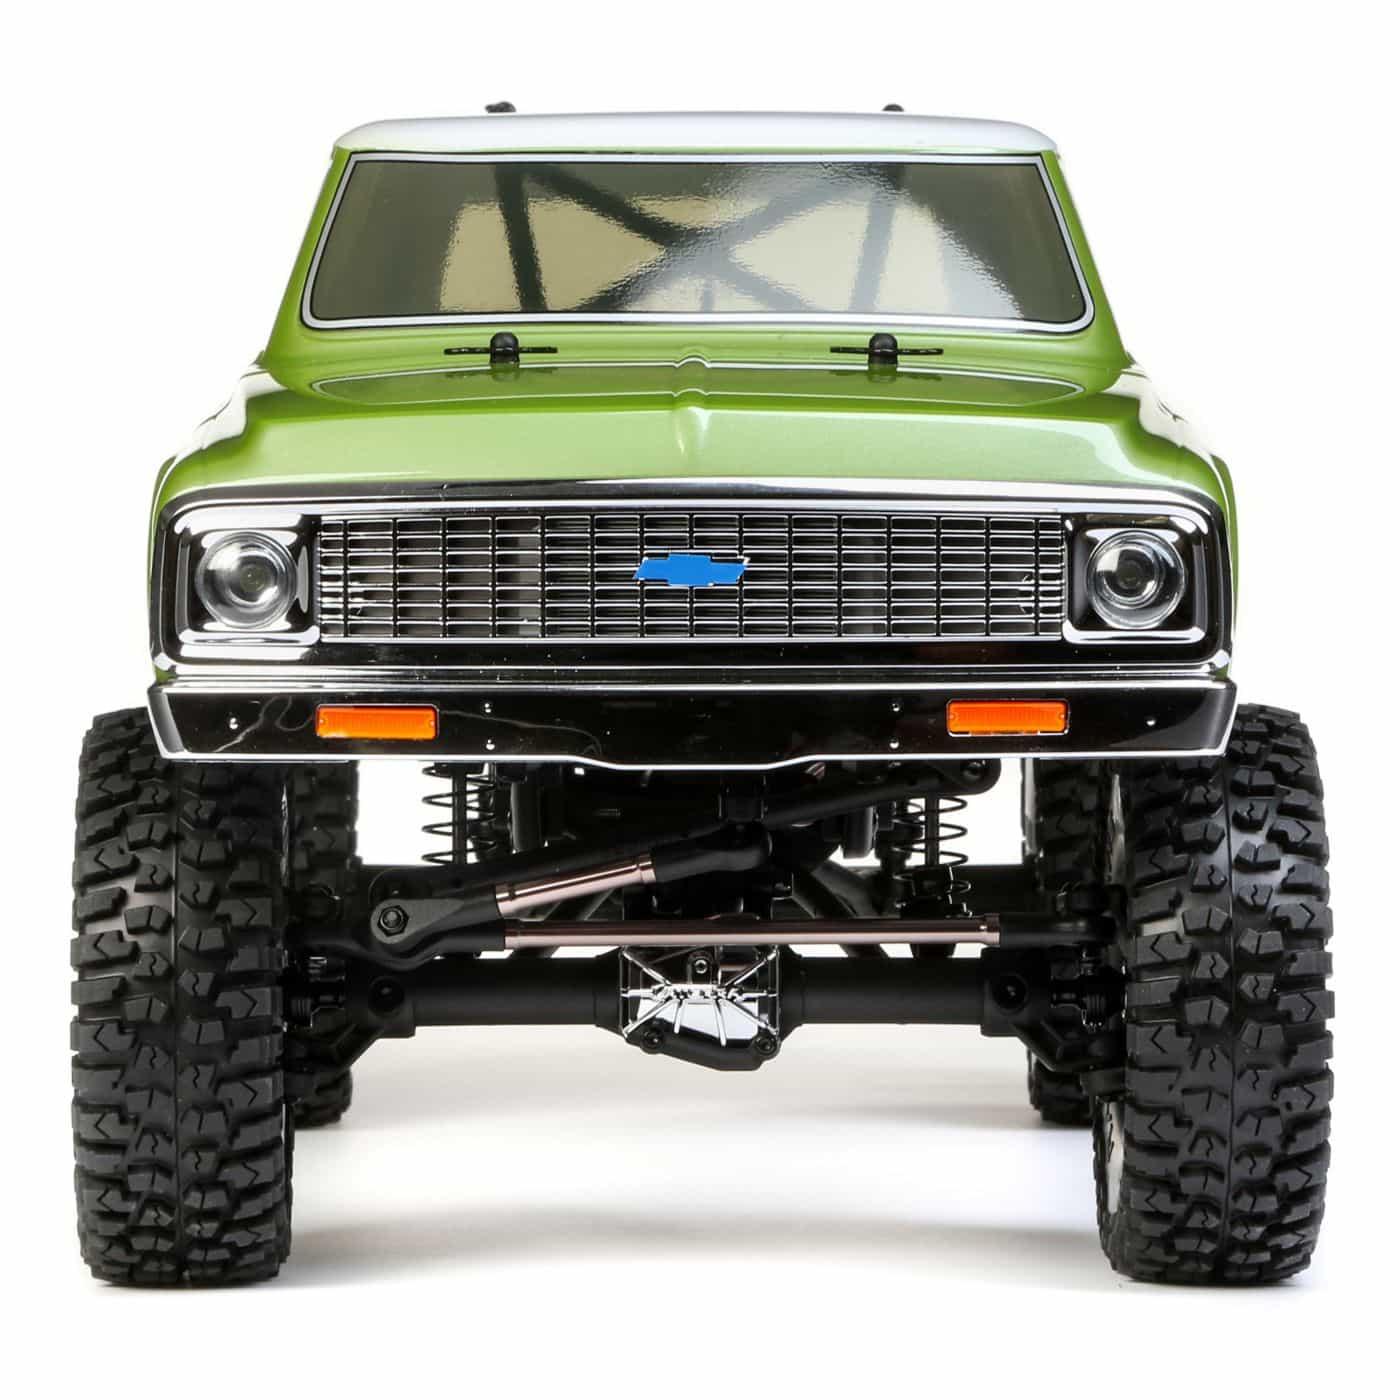 Vaterra 1972 Chevy Suburban Ascender - Front